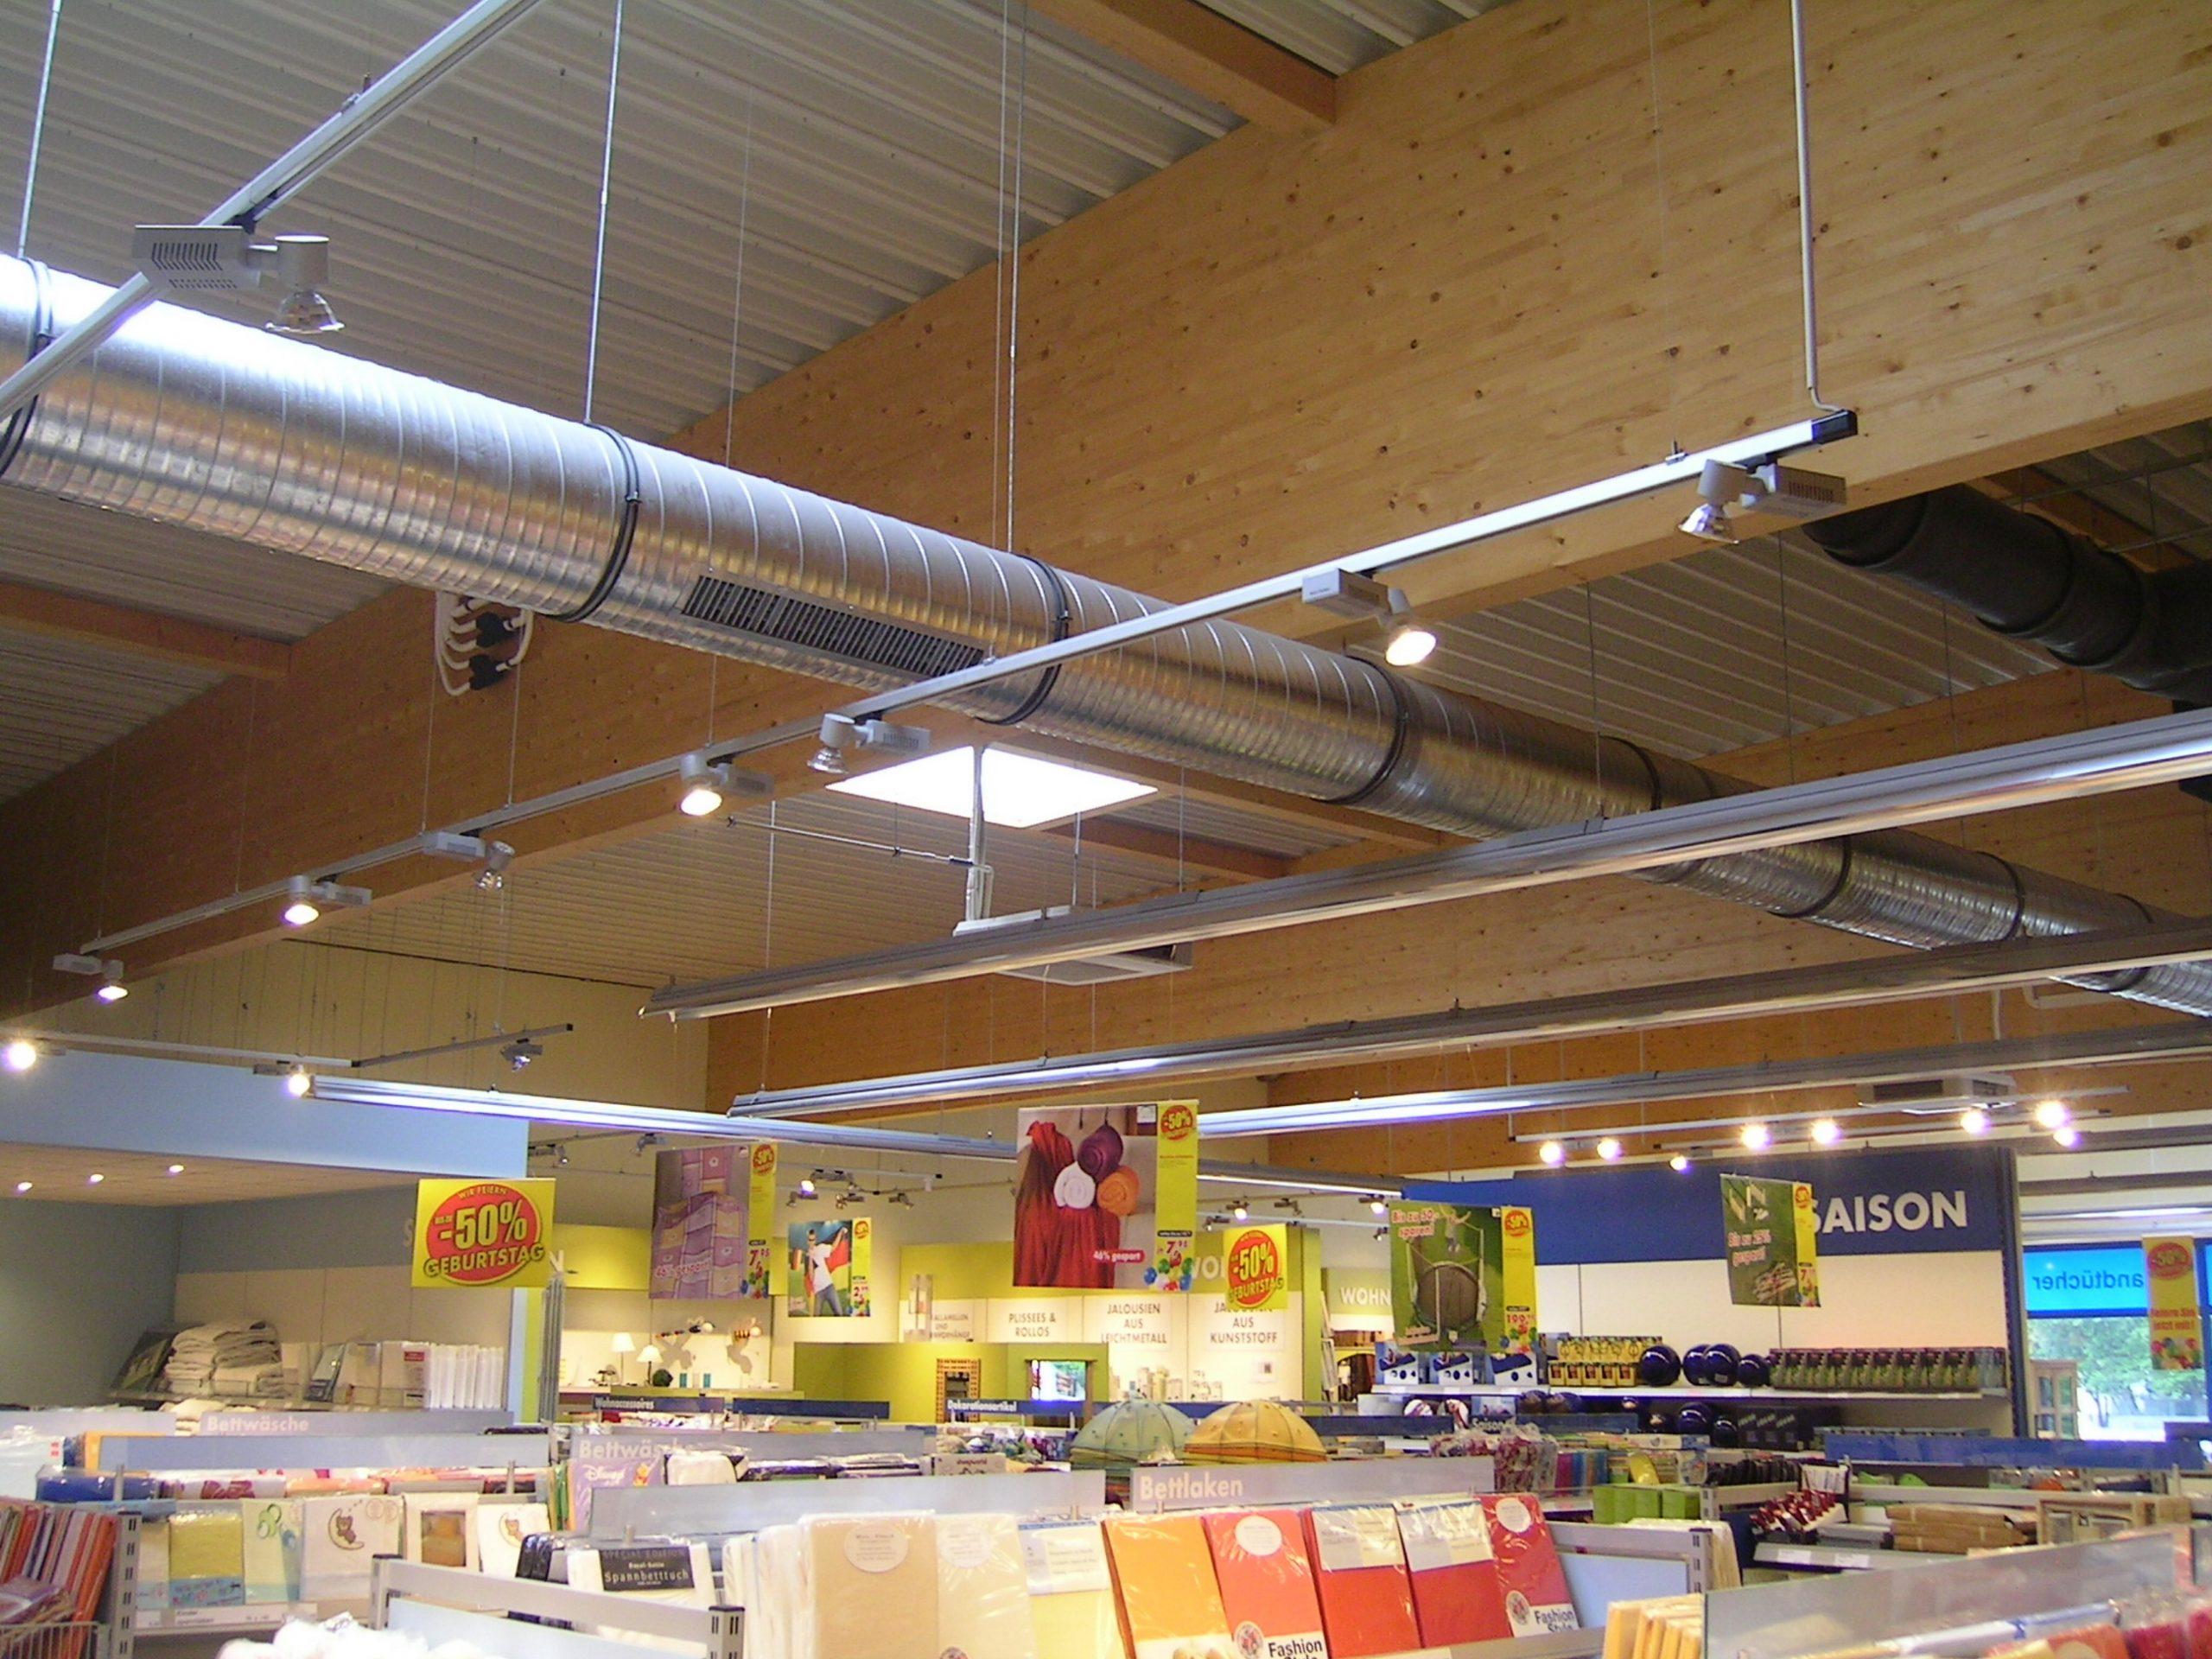 Satteldachbinder Markt BSH- Dachkonstruktion Schubfeld